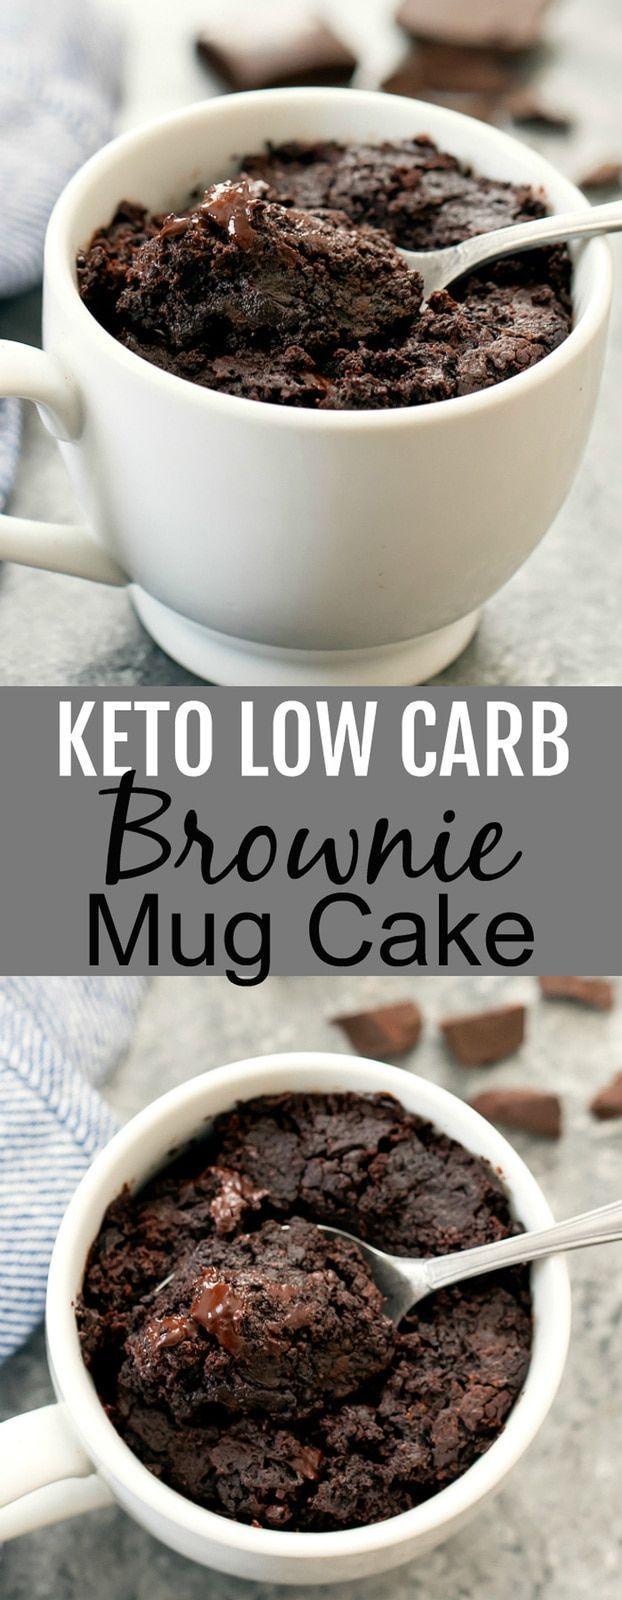 Keto Brownie Mug Cake